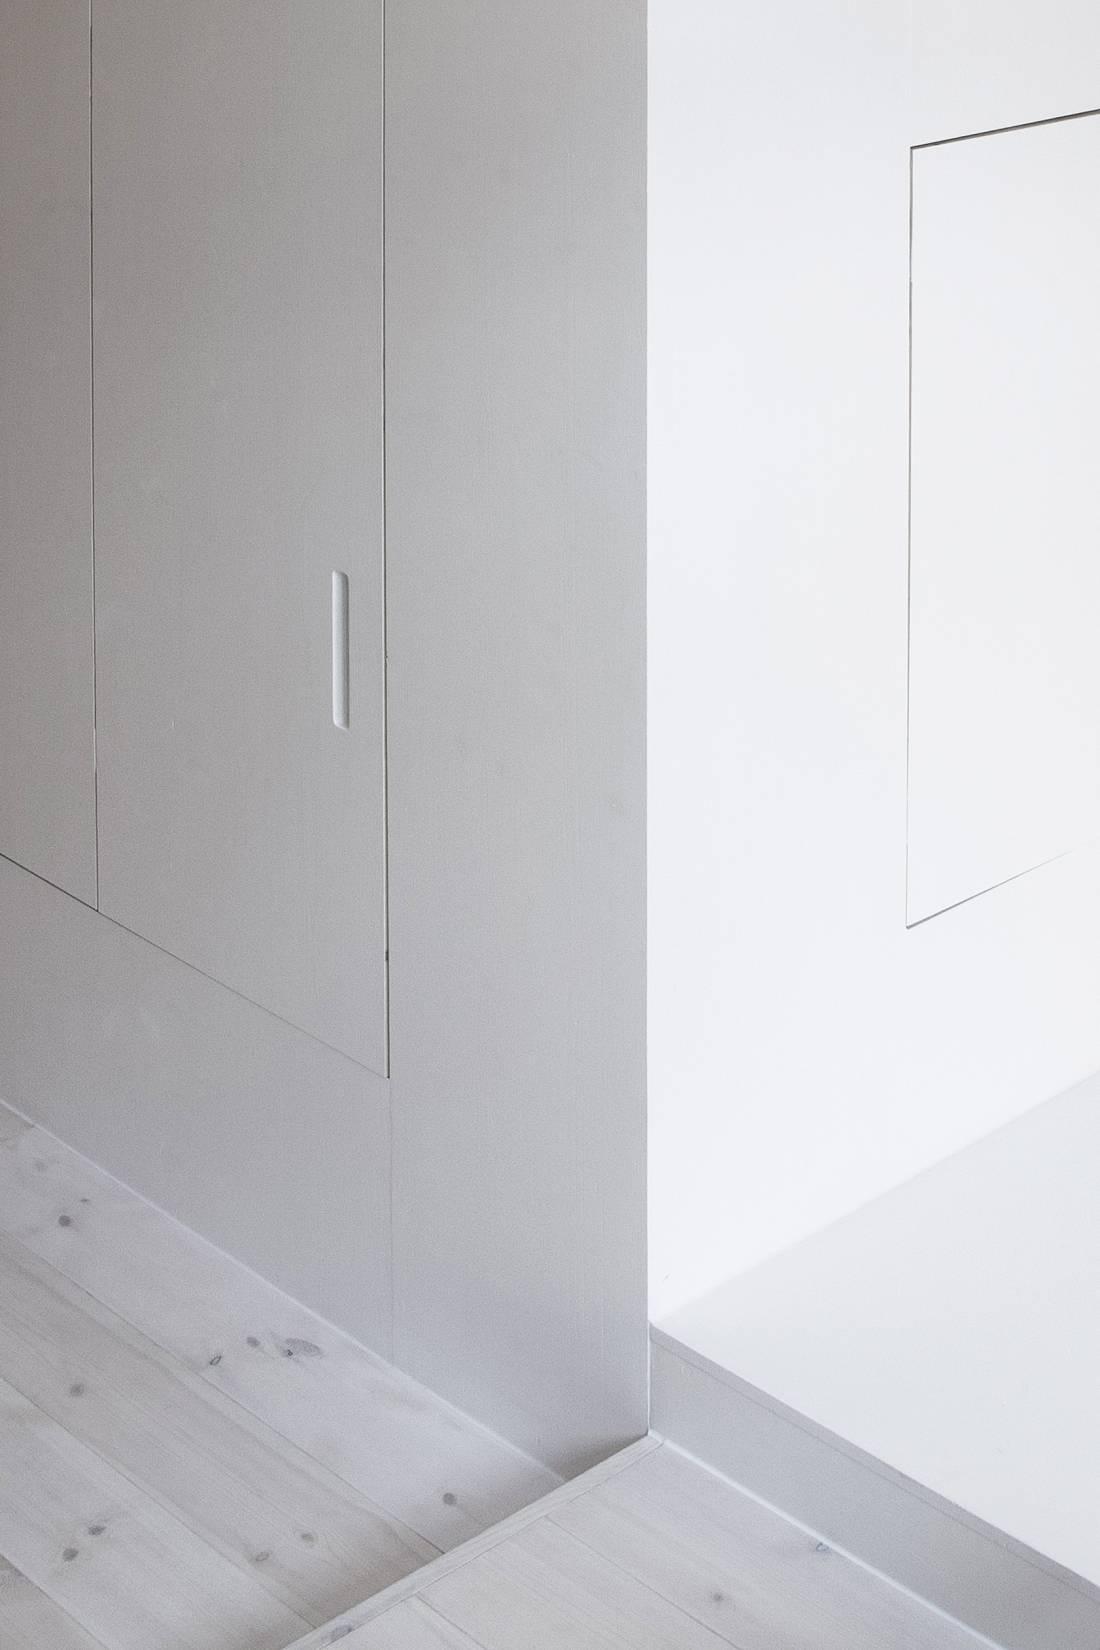 Room-304_Sigurd-Larsen_Michelberger-Hotel_Architecture-Danish-design-berlin_photo-Rita-Lino-4-550x825@2x.jpg